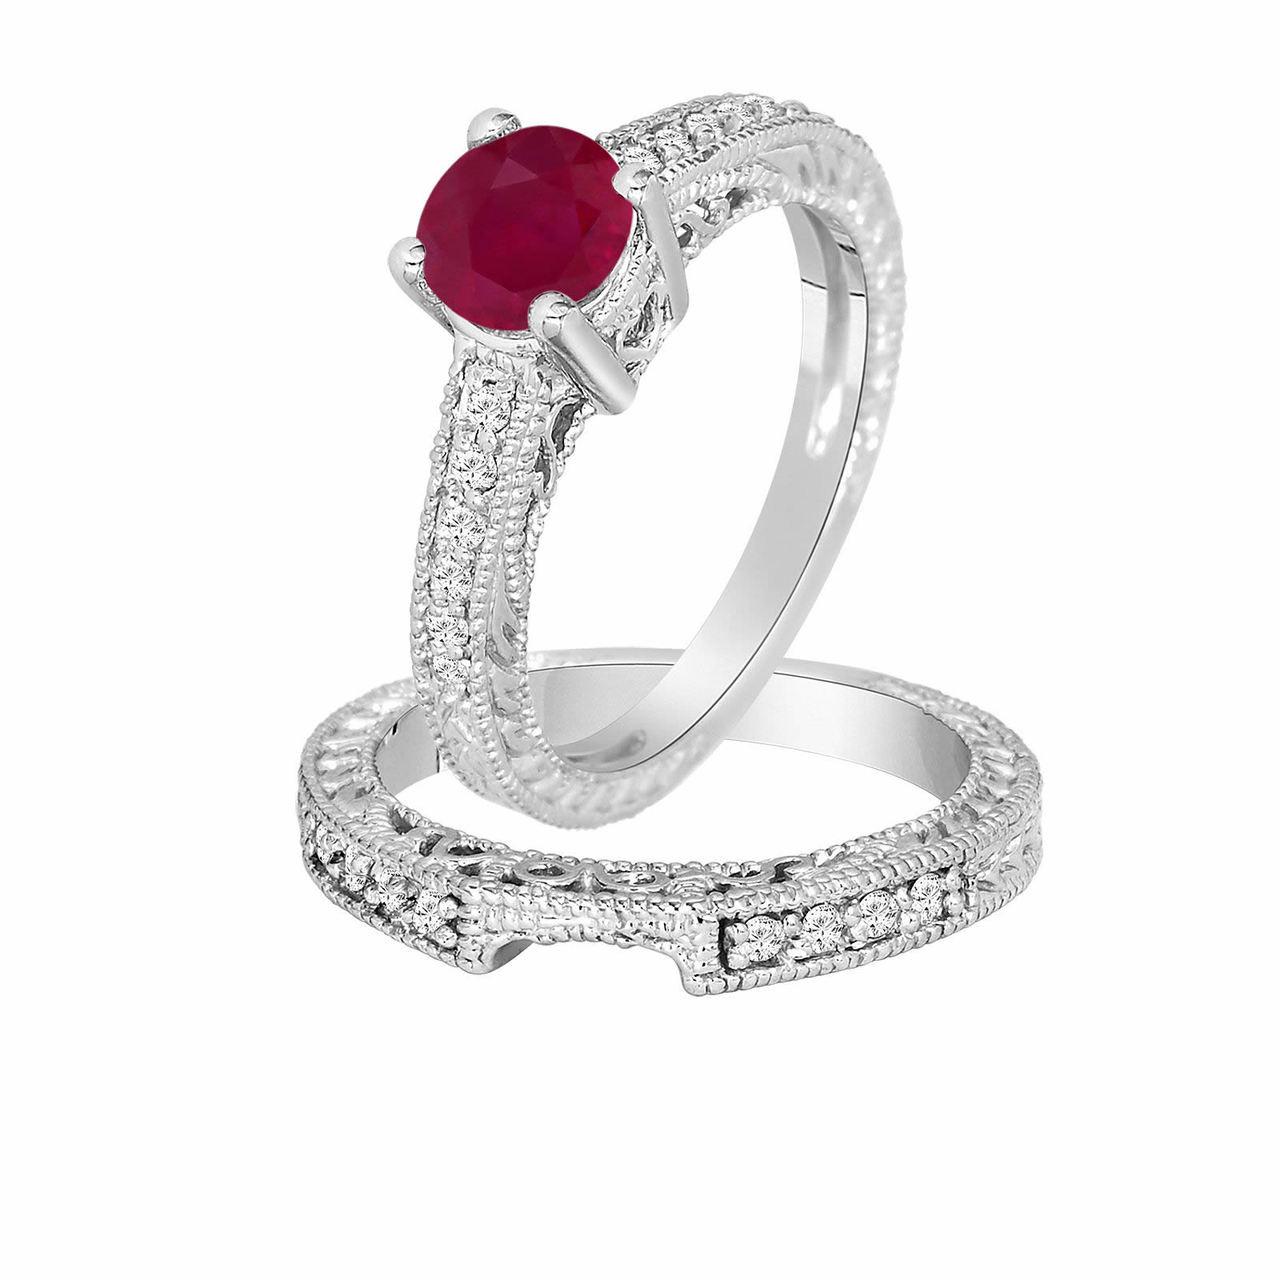 0 87 Carat Ruby Diamond Engagement Ring Wedding Anniversary Band